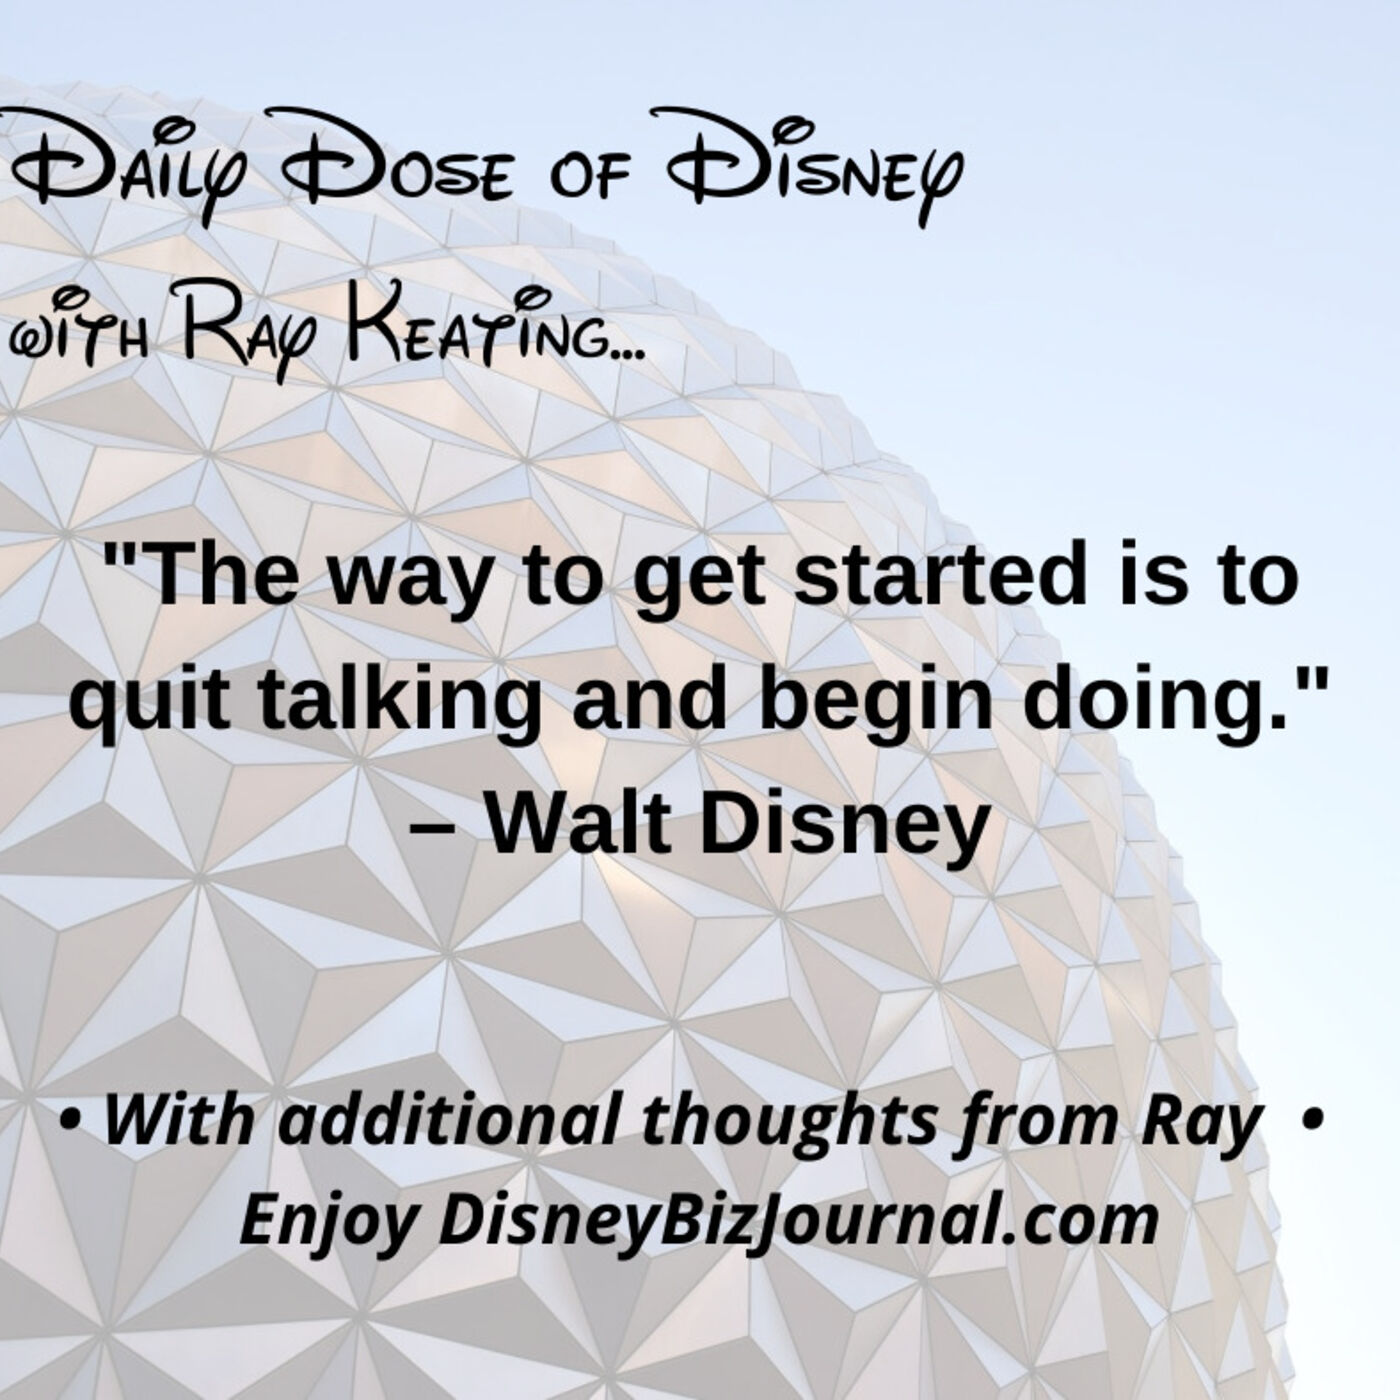 Episode #60: Walt Disney on Doing